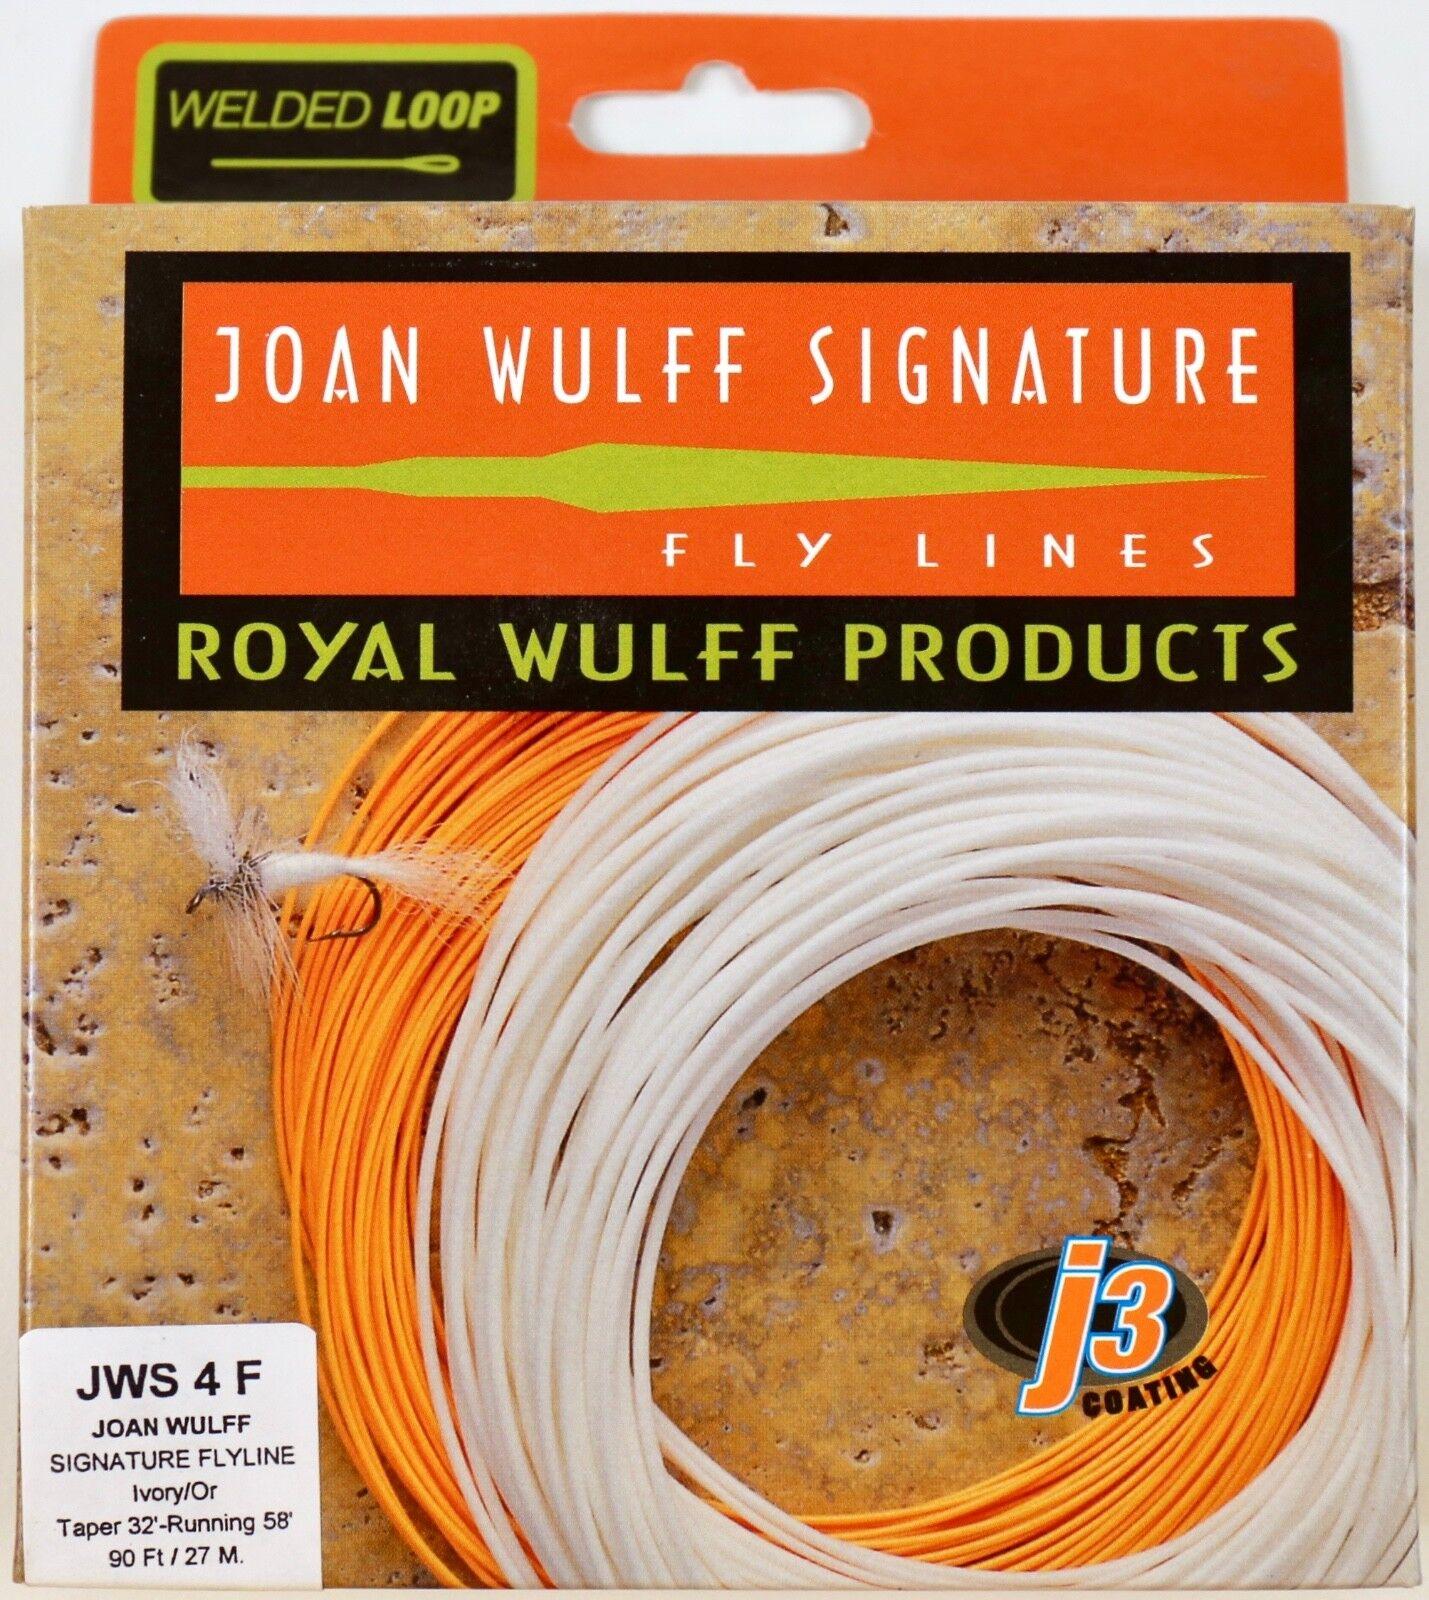 Royal Wulff Joan Wulff firma 4 WT Flotante Línea Mosca Envío Gratuito JWS4F